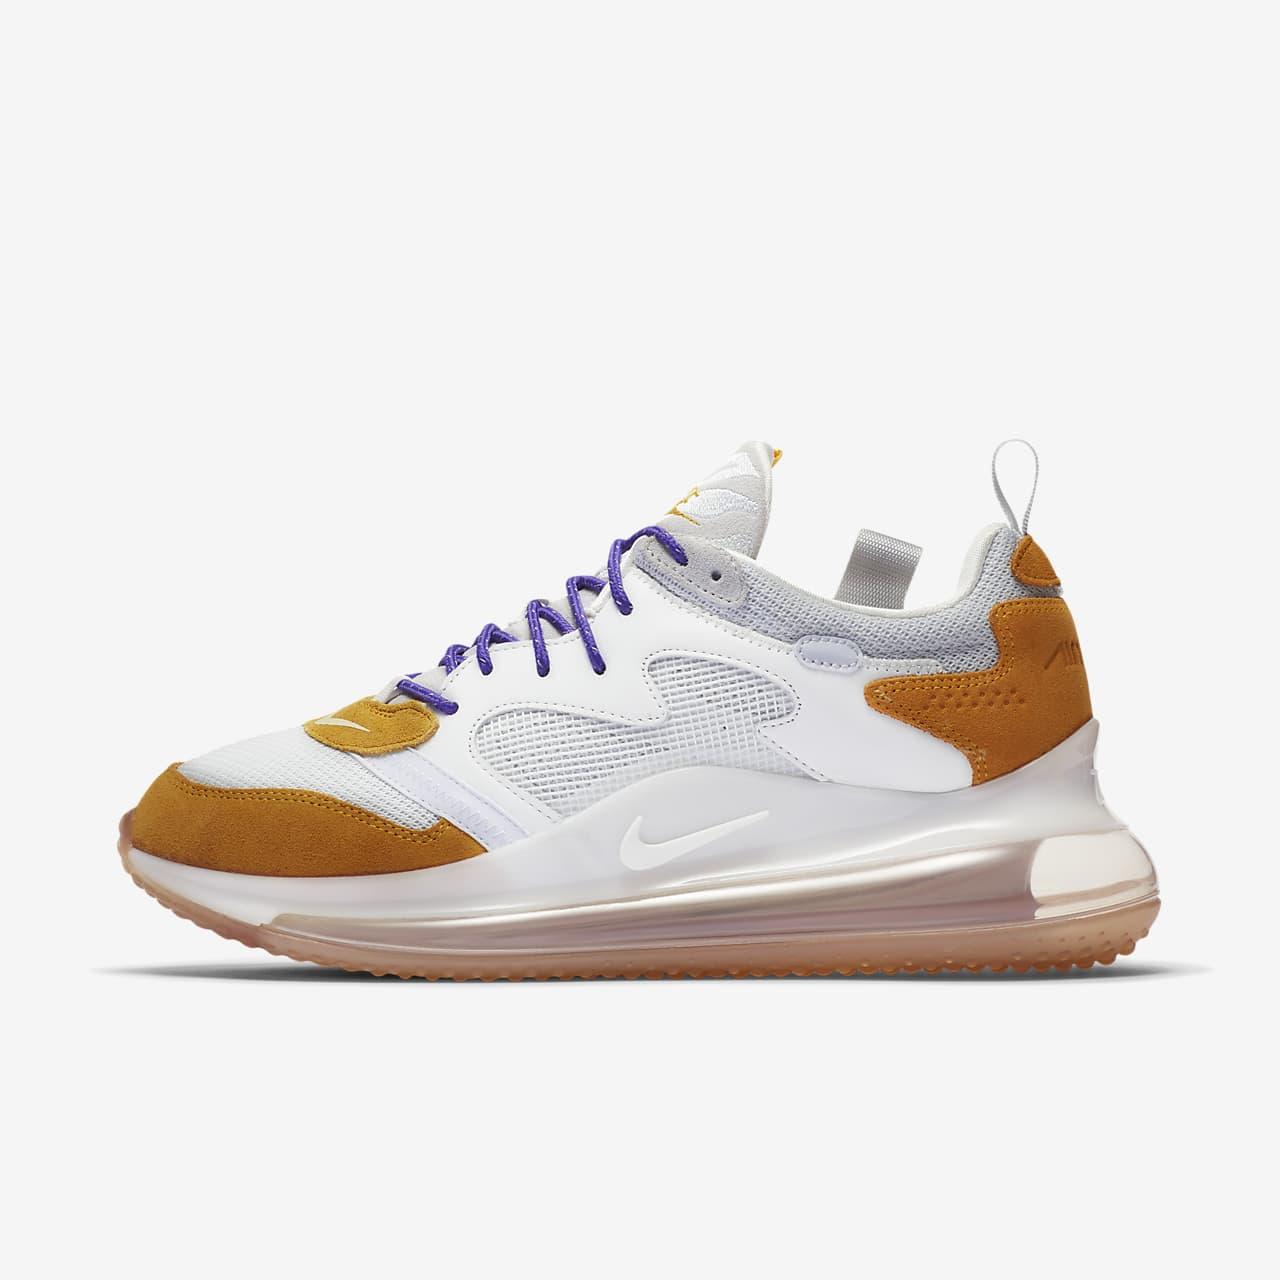 Nike Air Max 720 (OBJ) Herrenschuh